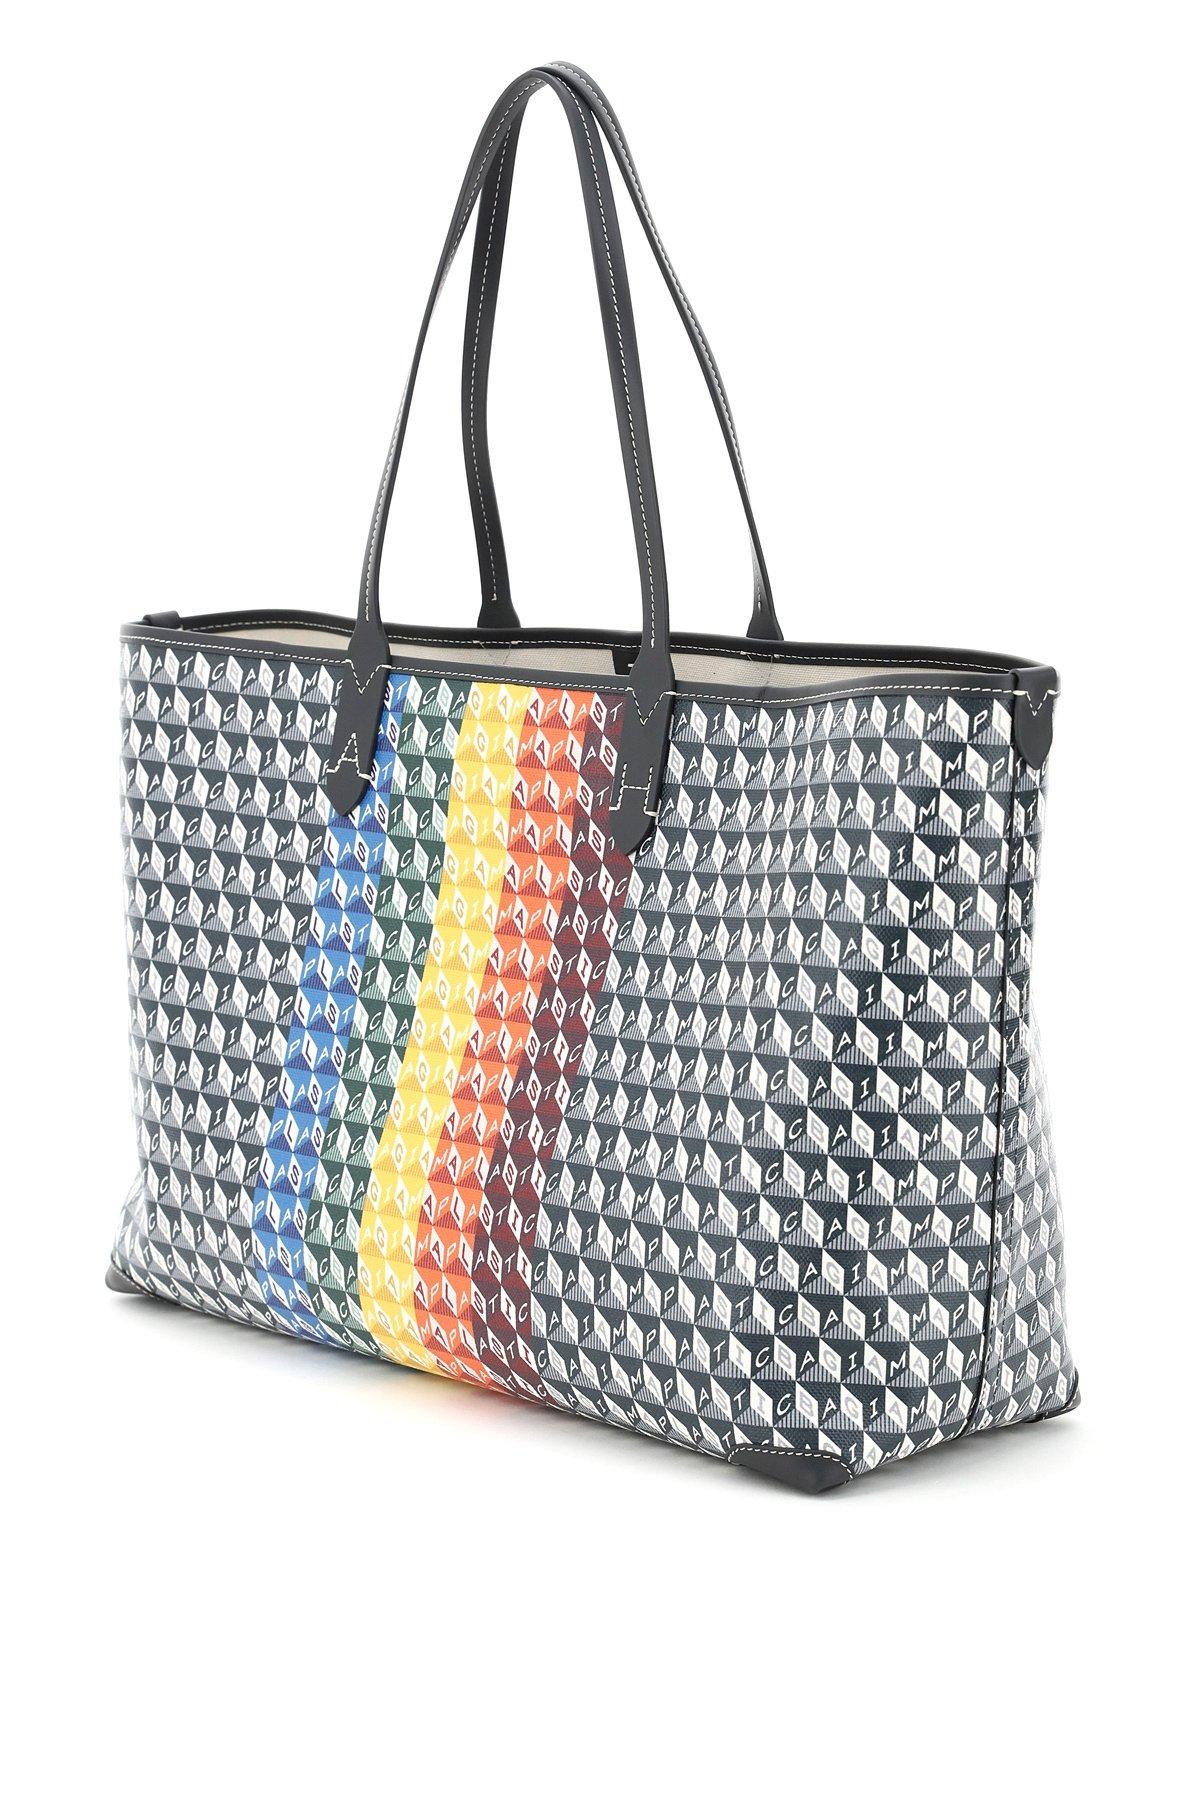 "Anya hindmarch borsa shopping grande ""i am a plastic bag"""